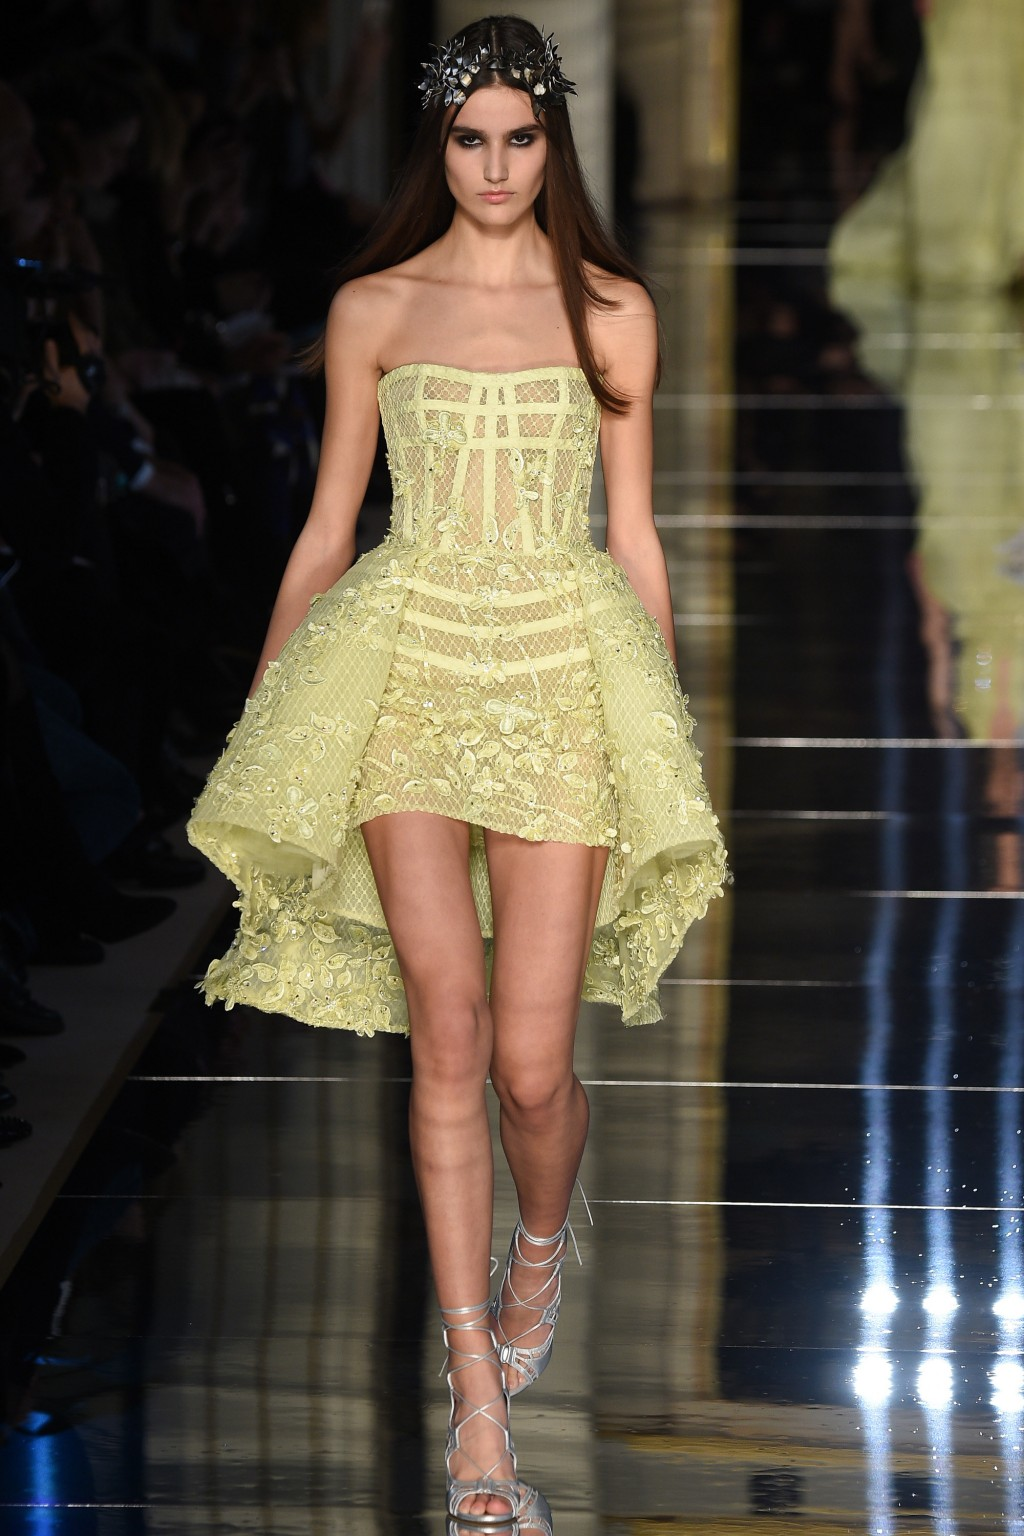 zuhair-murad-spring-2016-dress-cheryl-fernandez-1024x1536